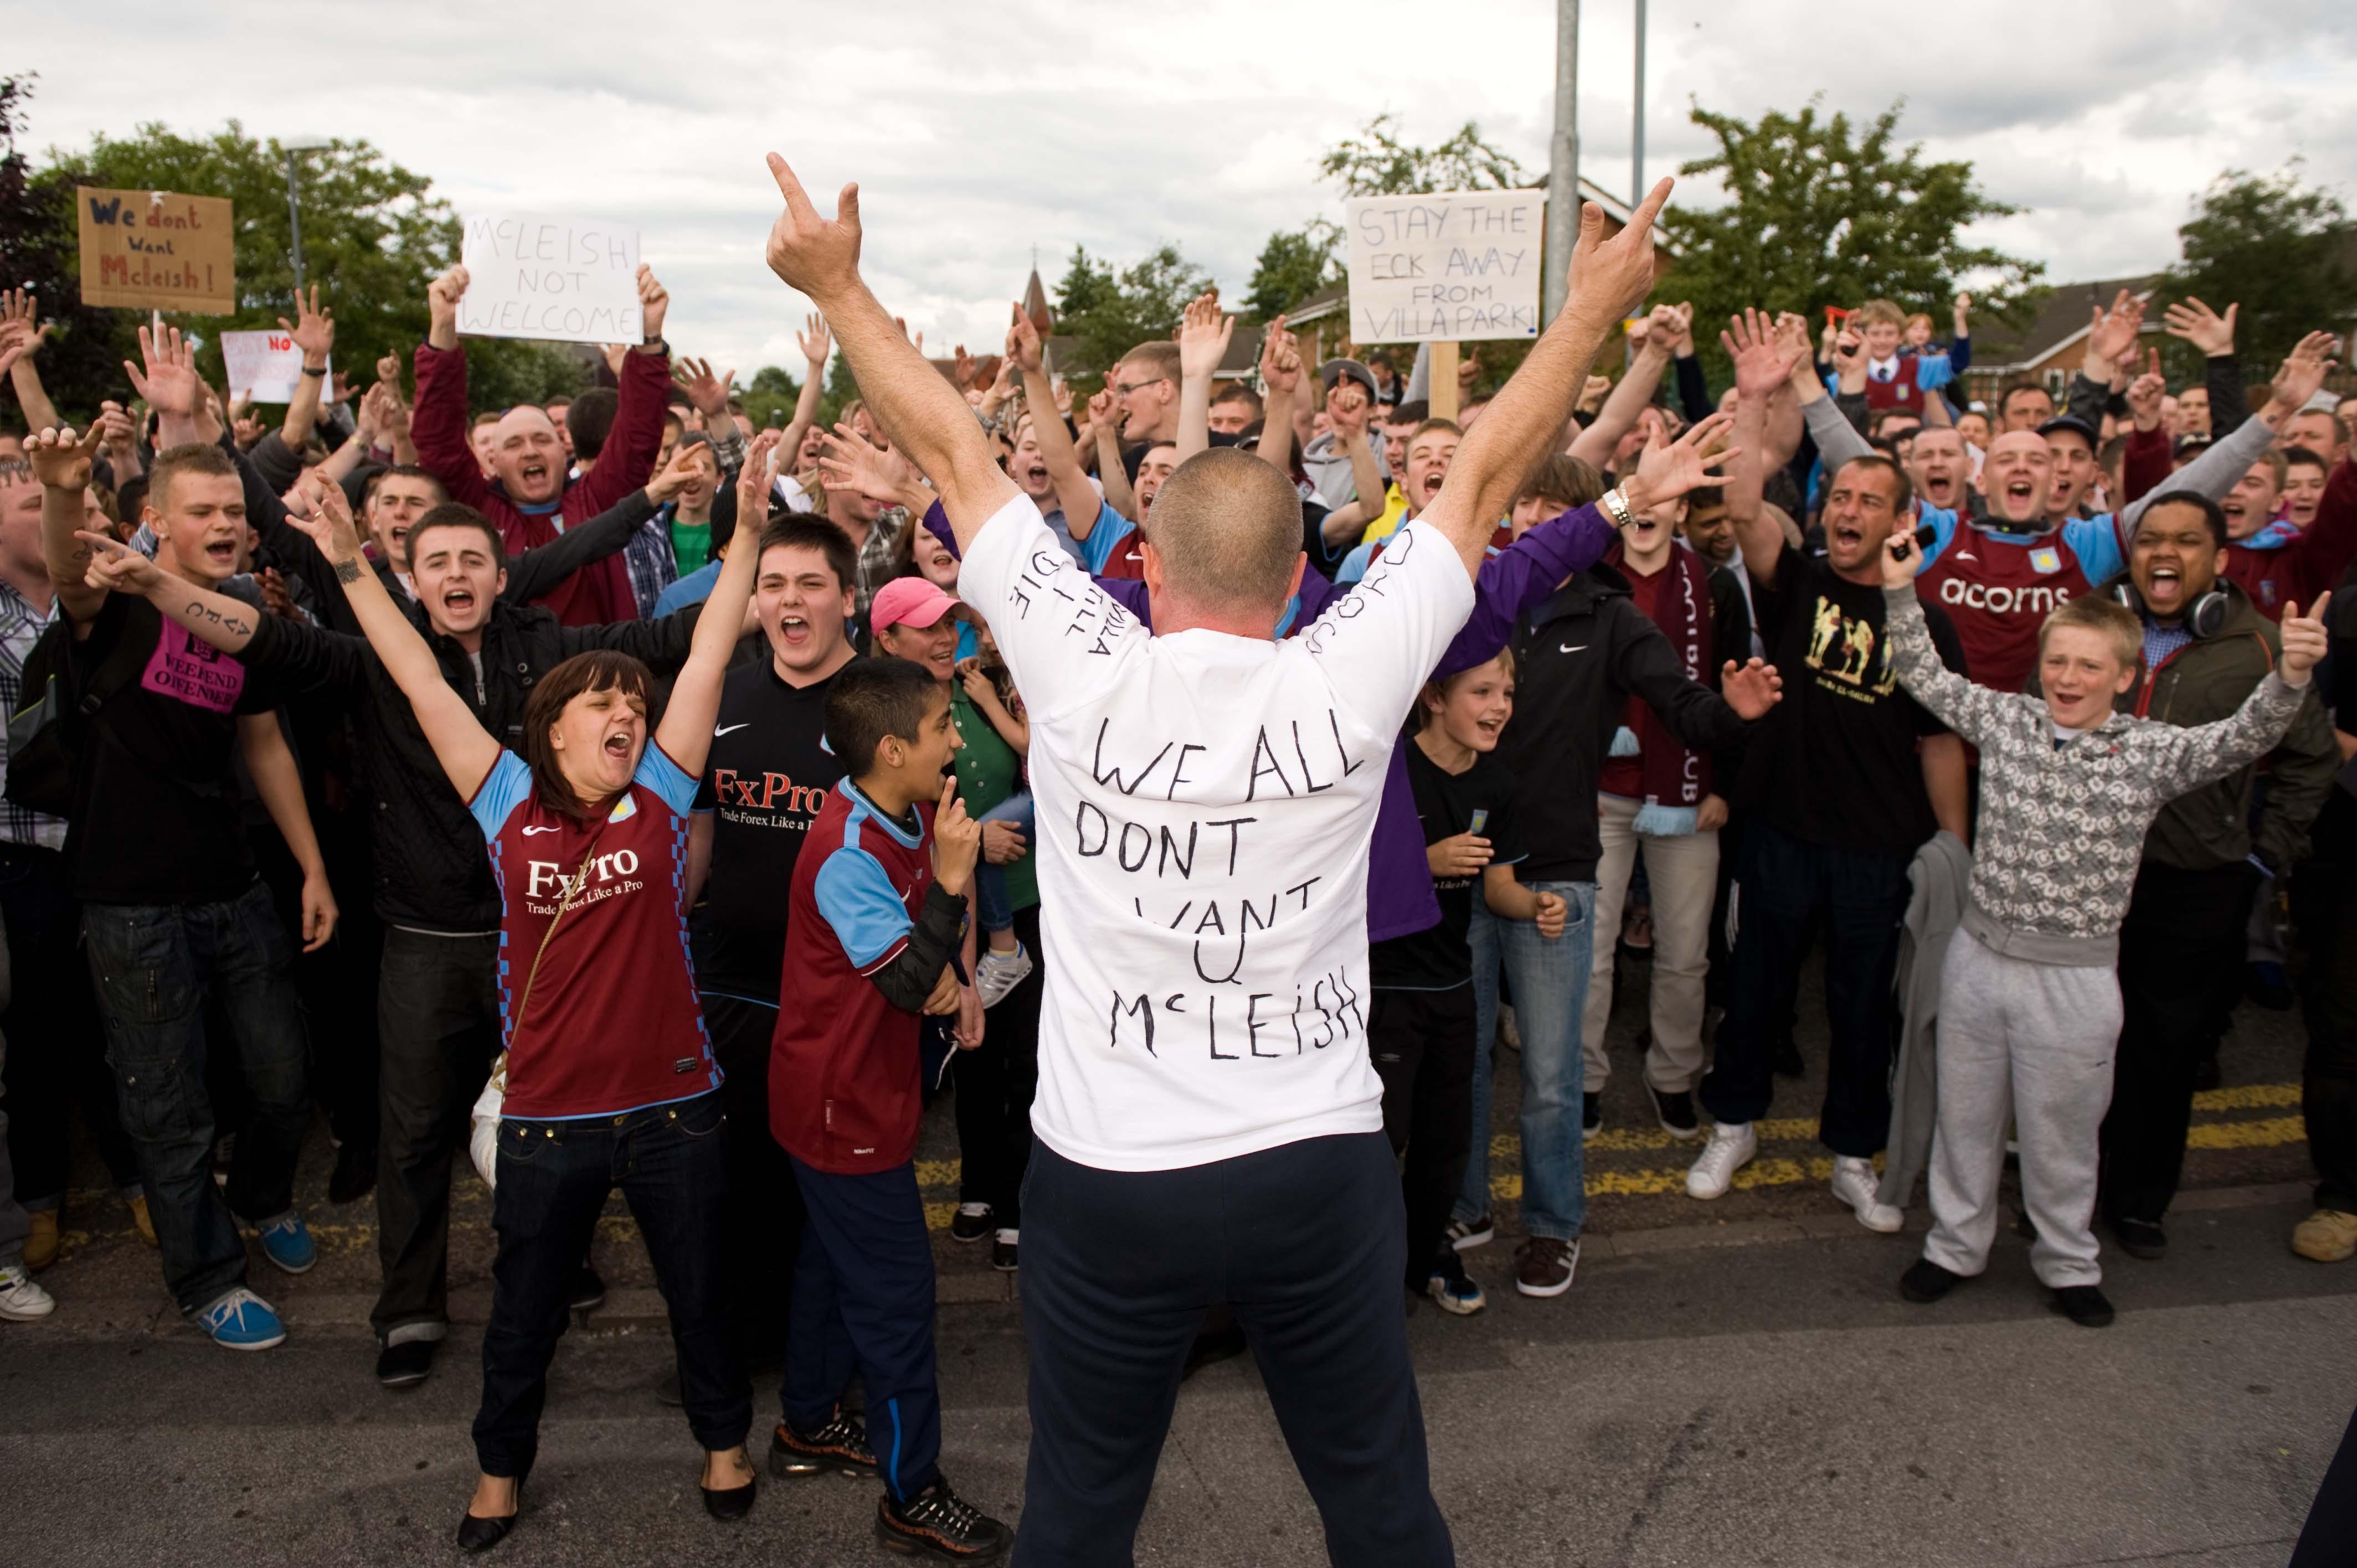 Villa fans protest over McLeish